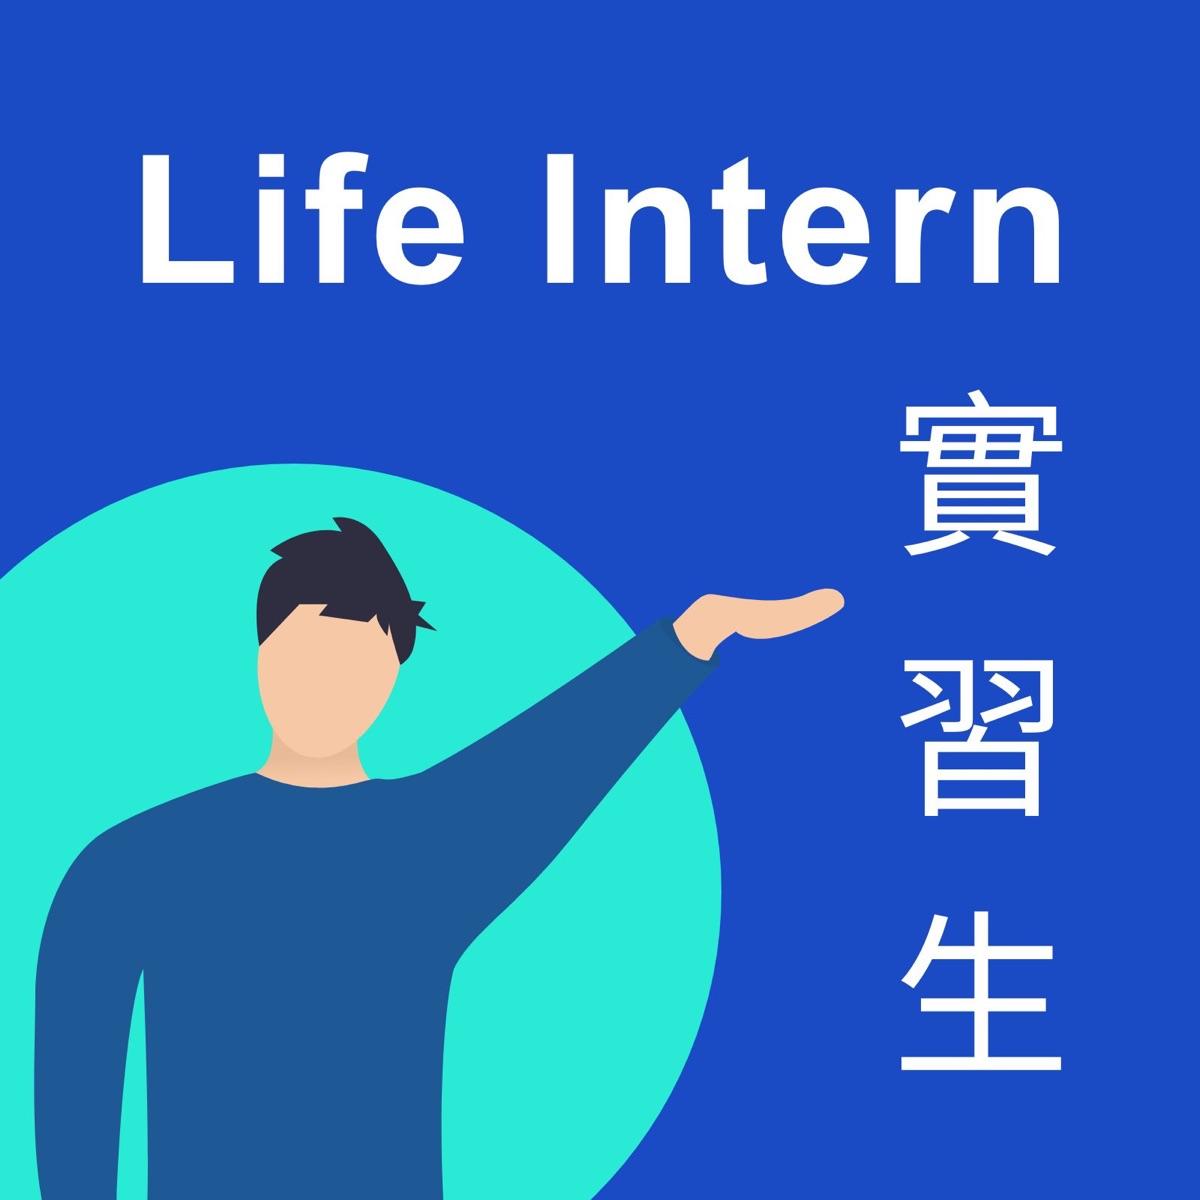 Life Intern 實習生